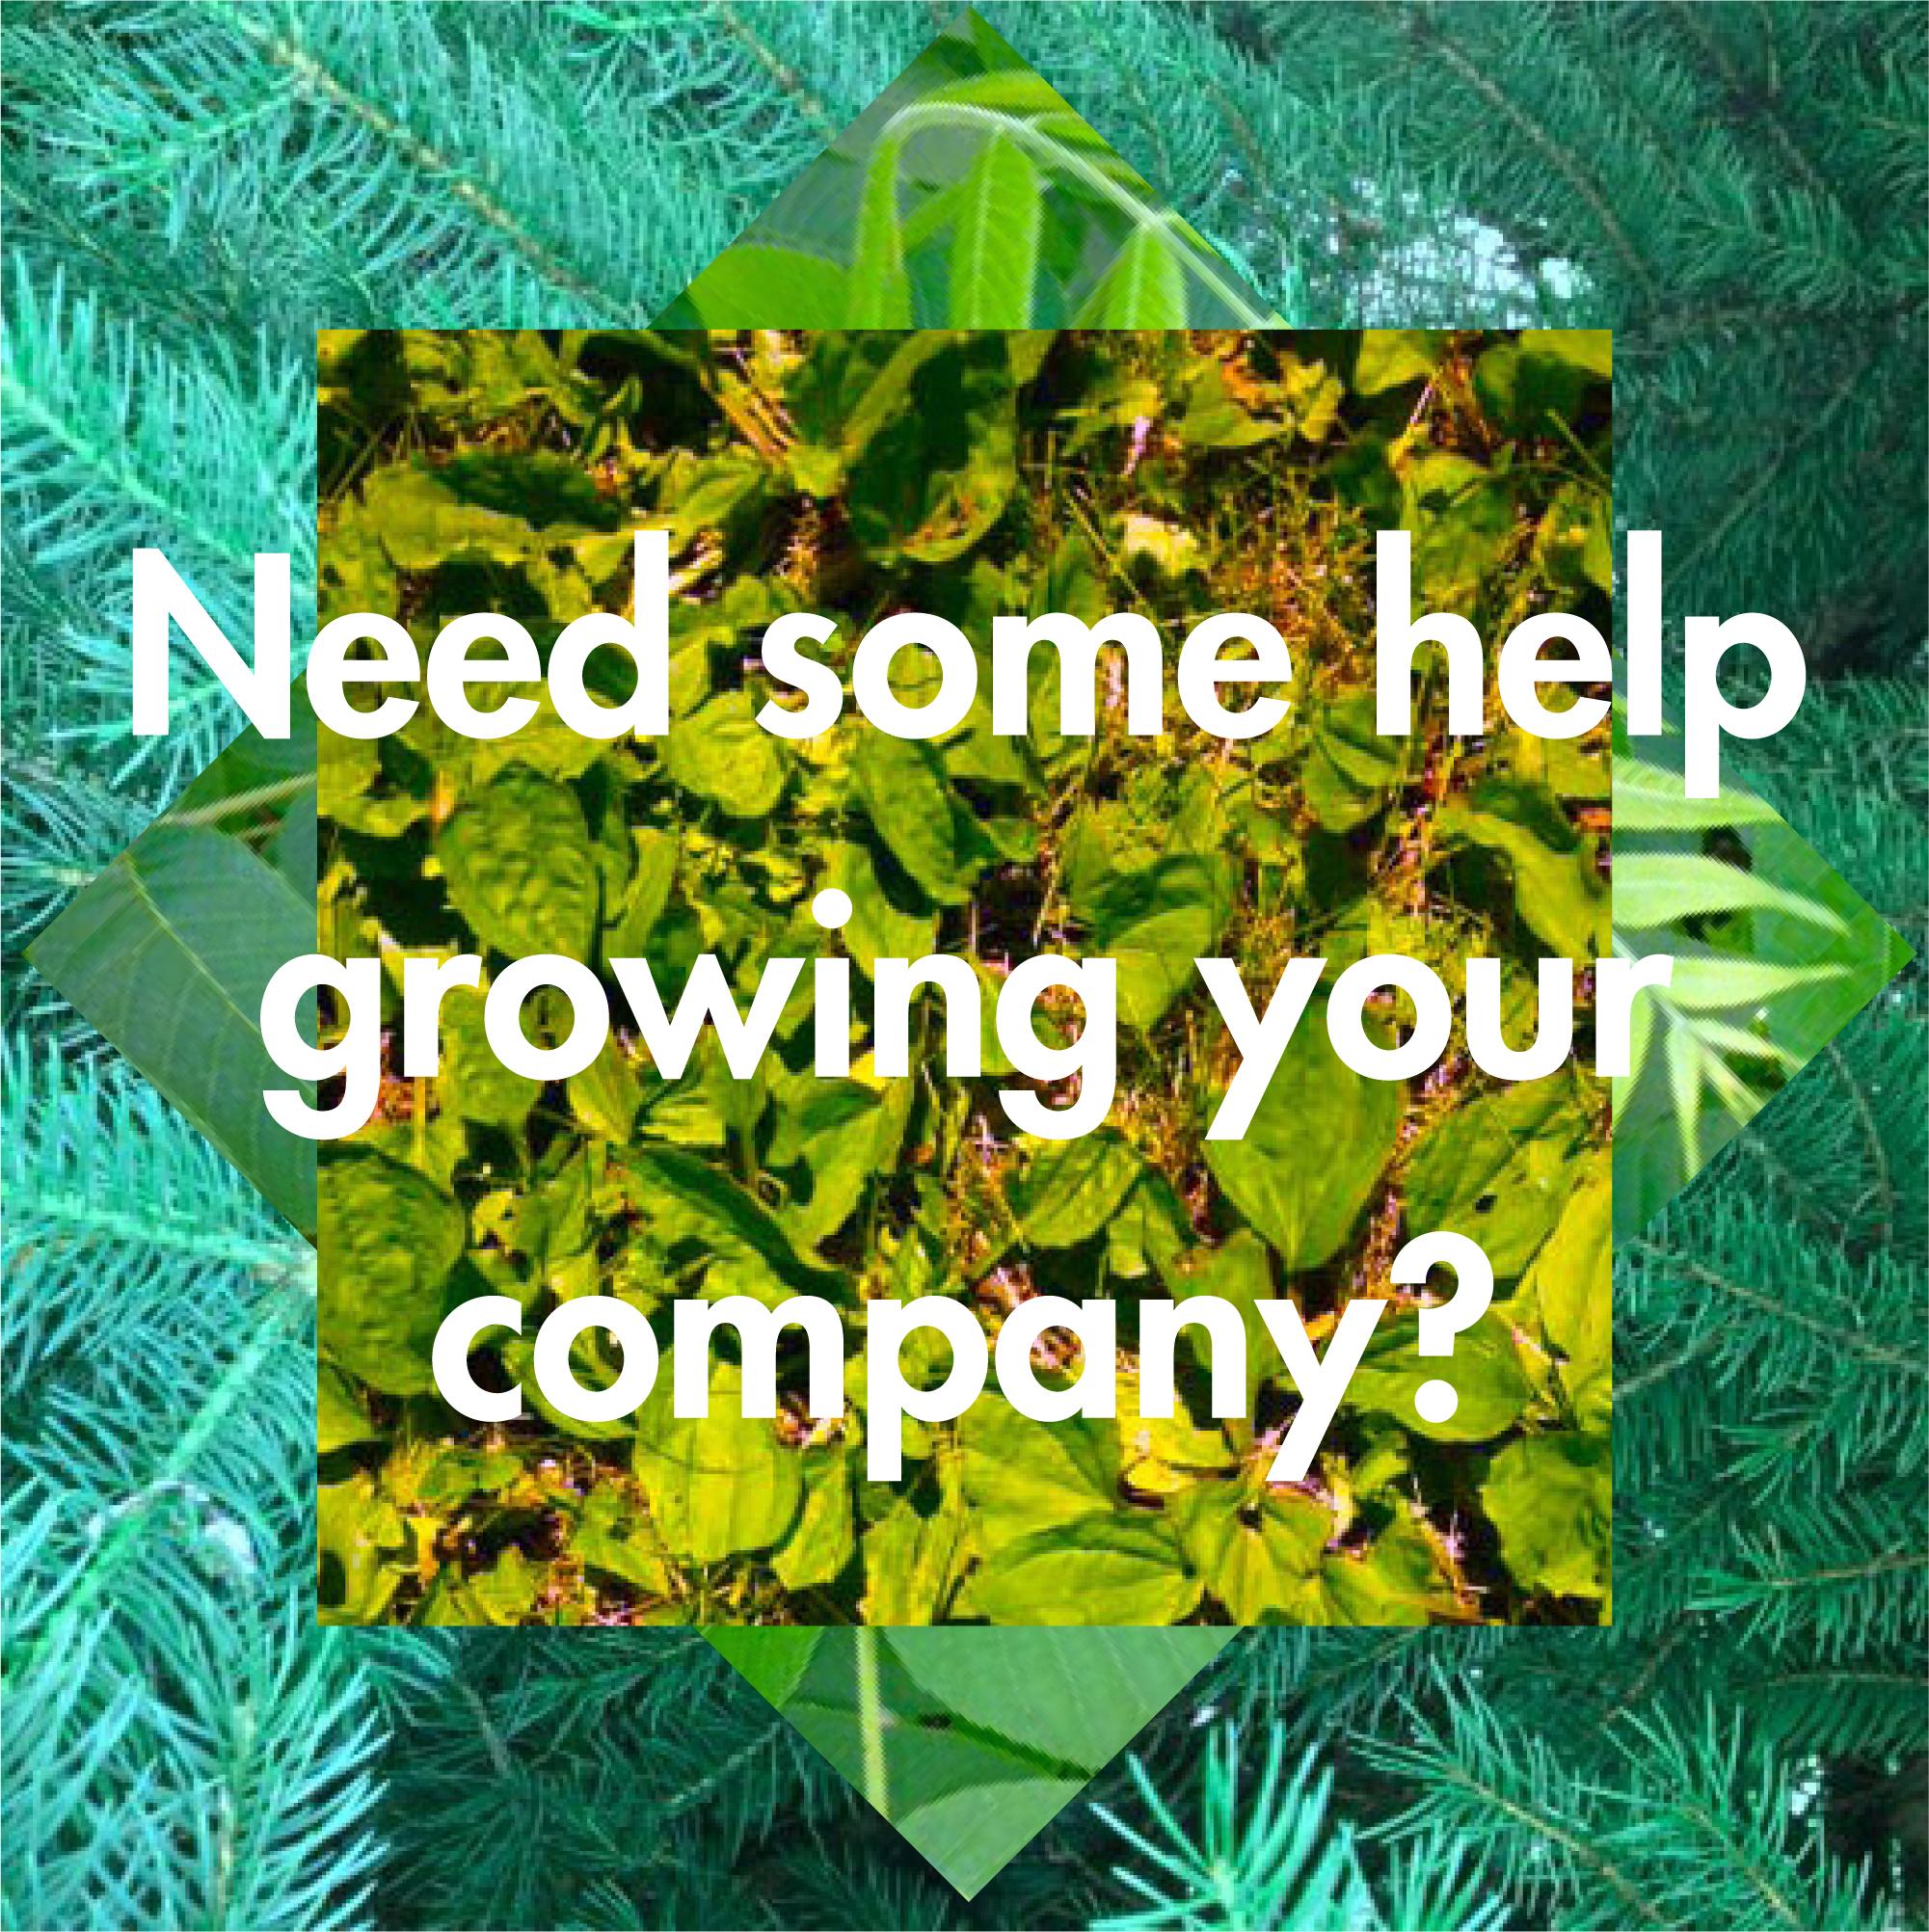 growyourcompany